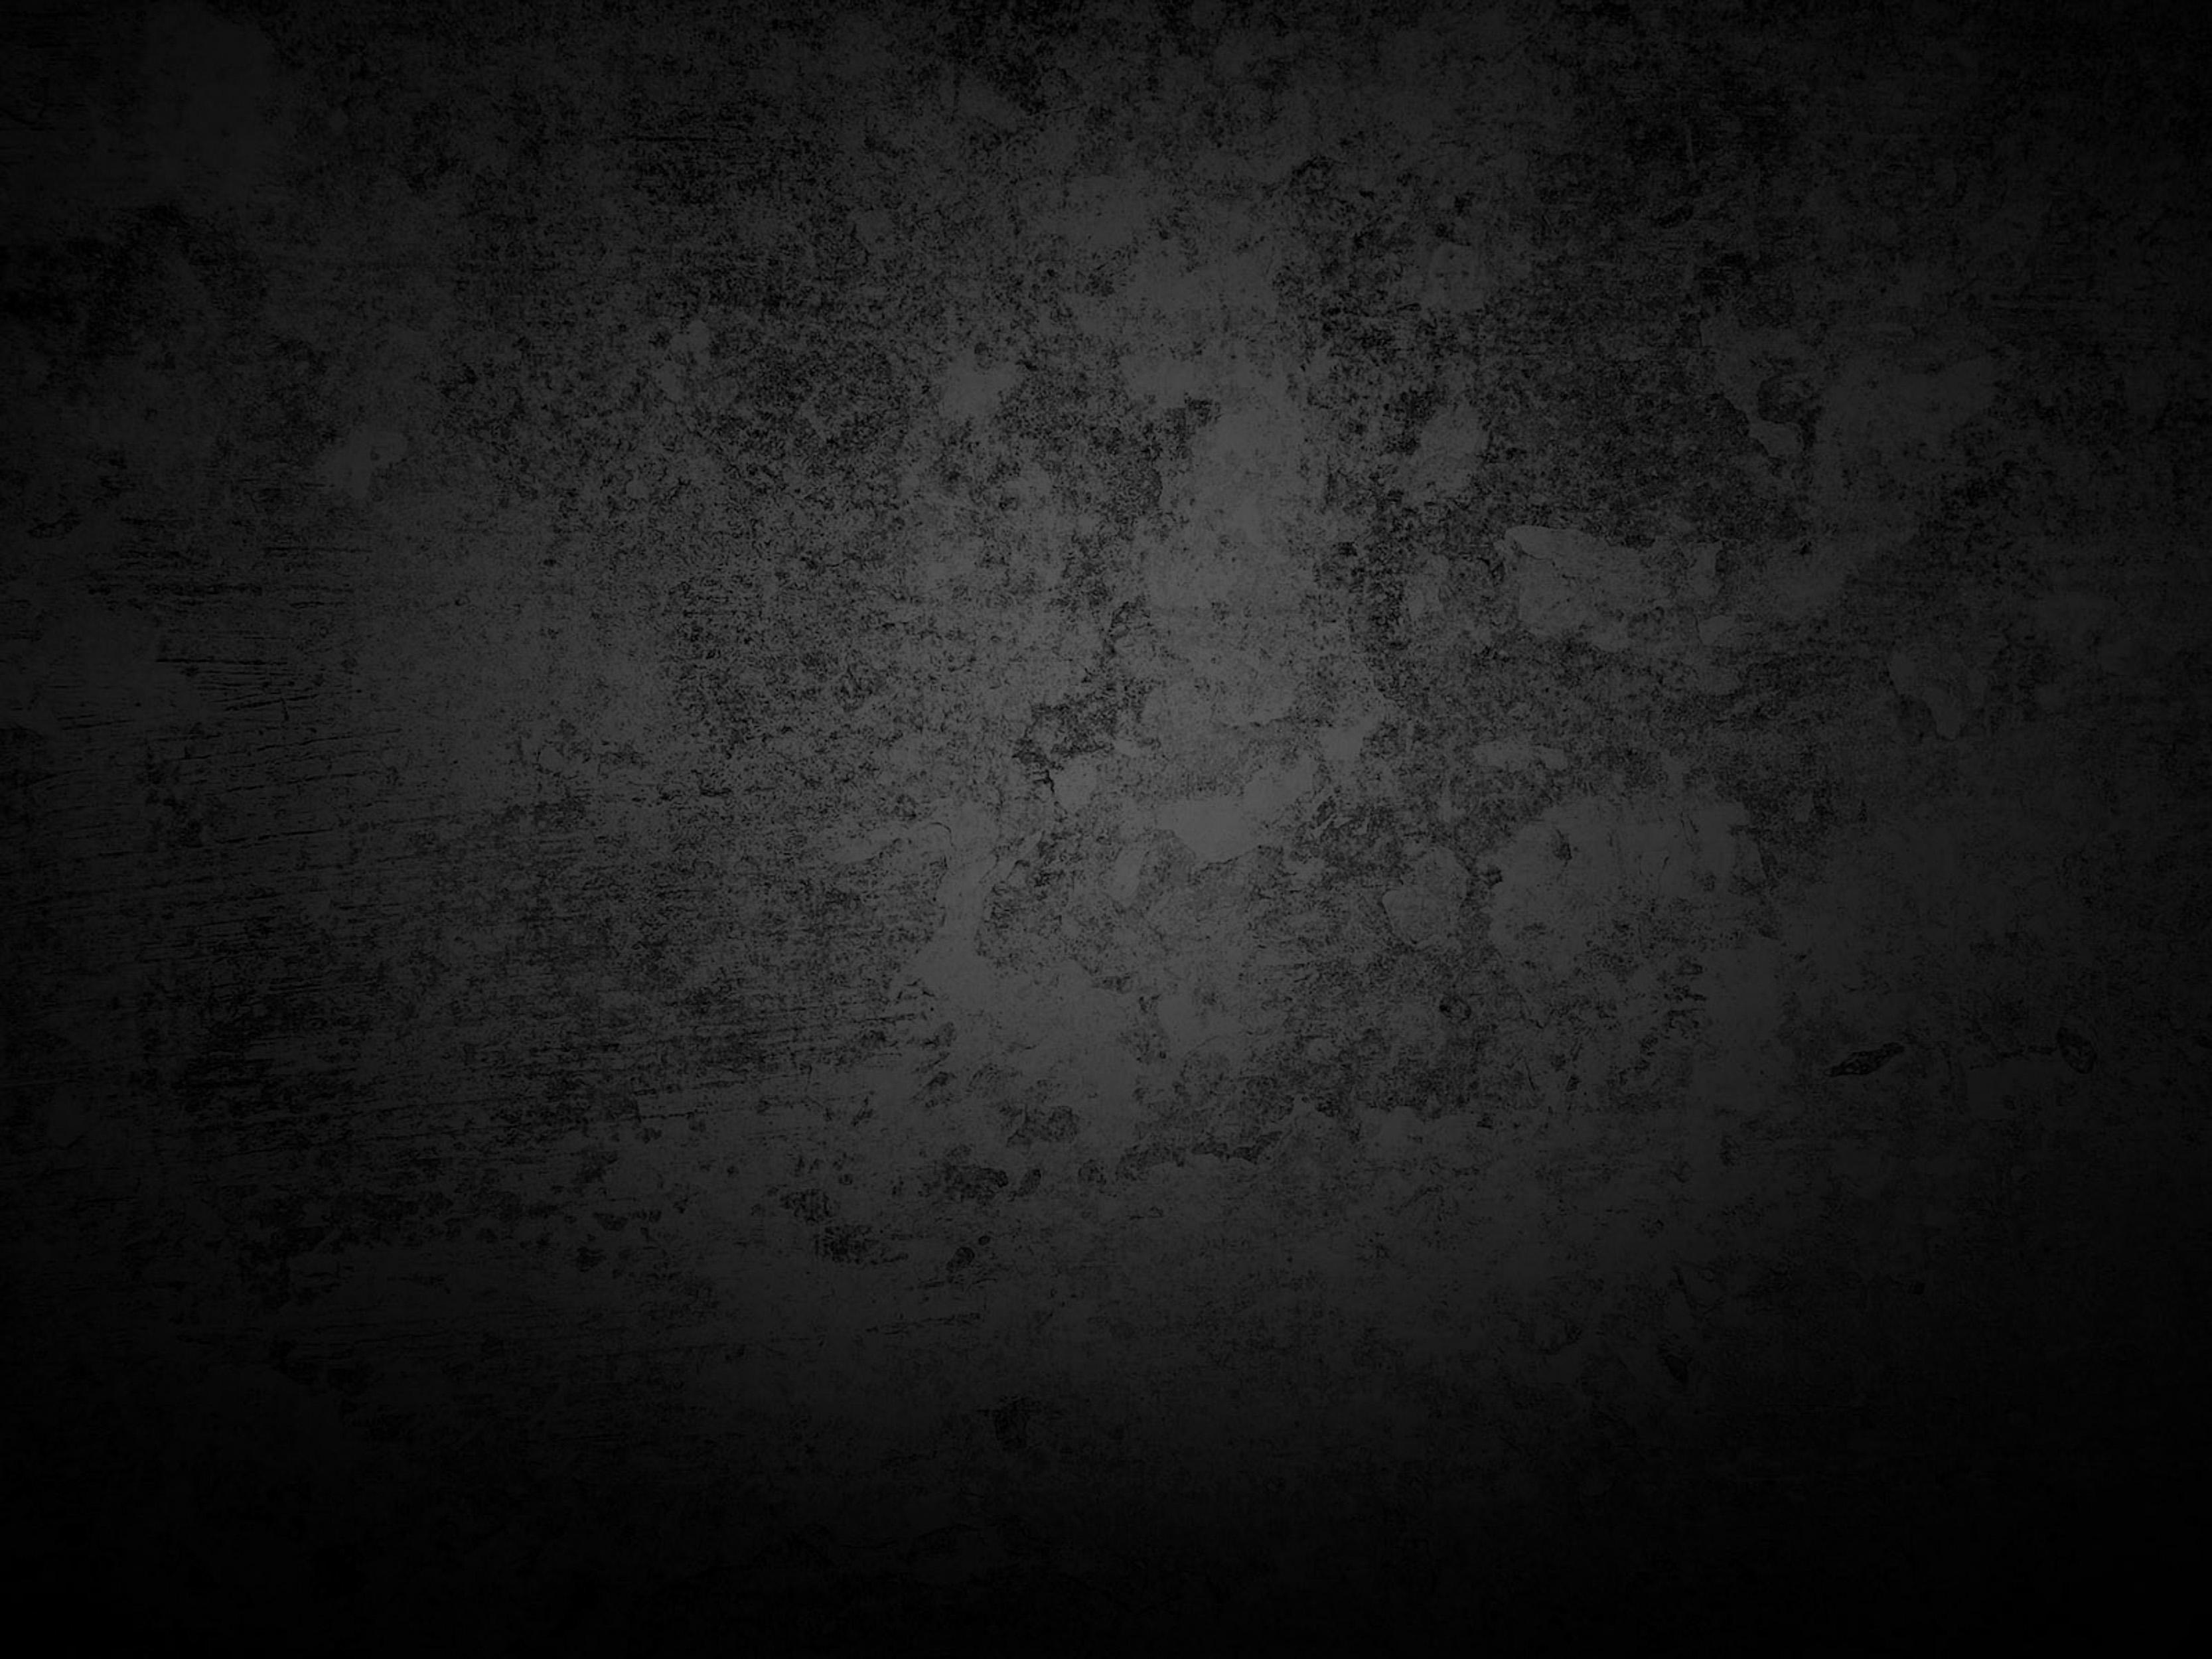 textured black background poster  black  textured  old